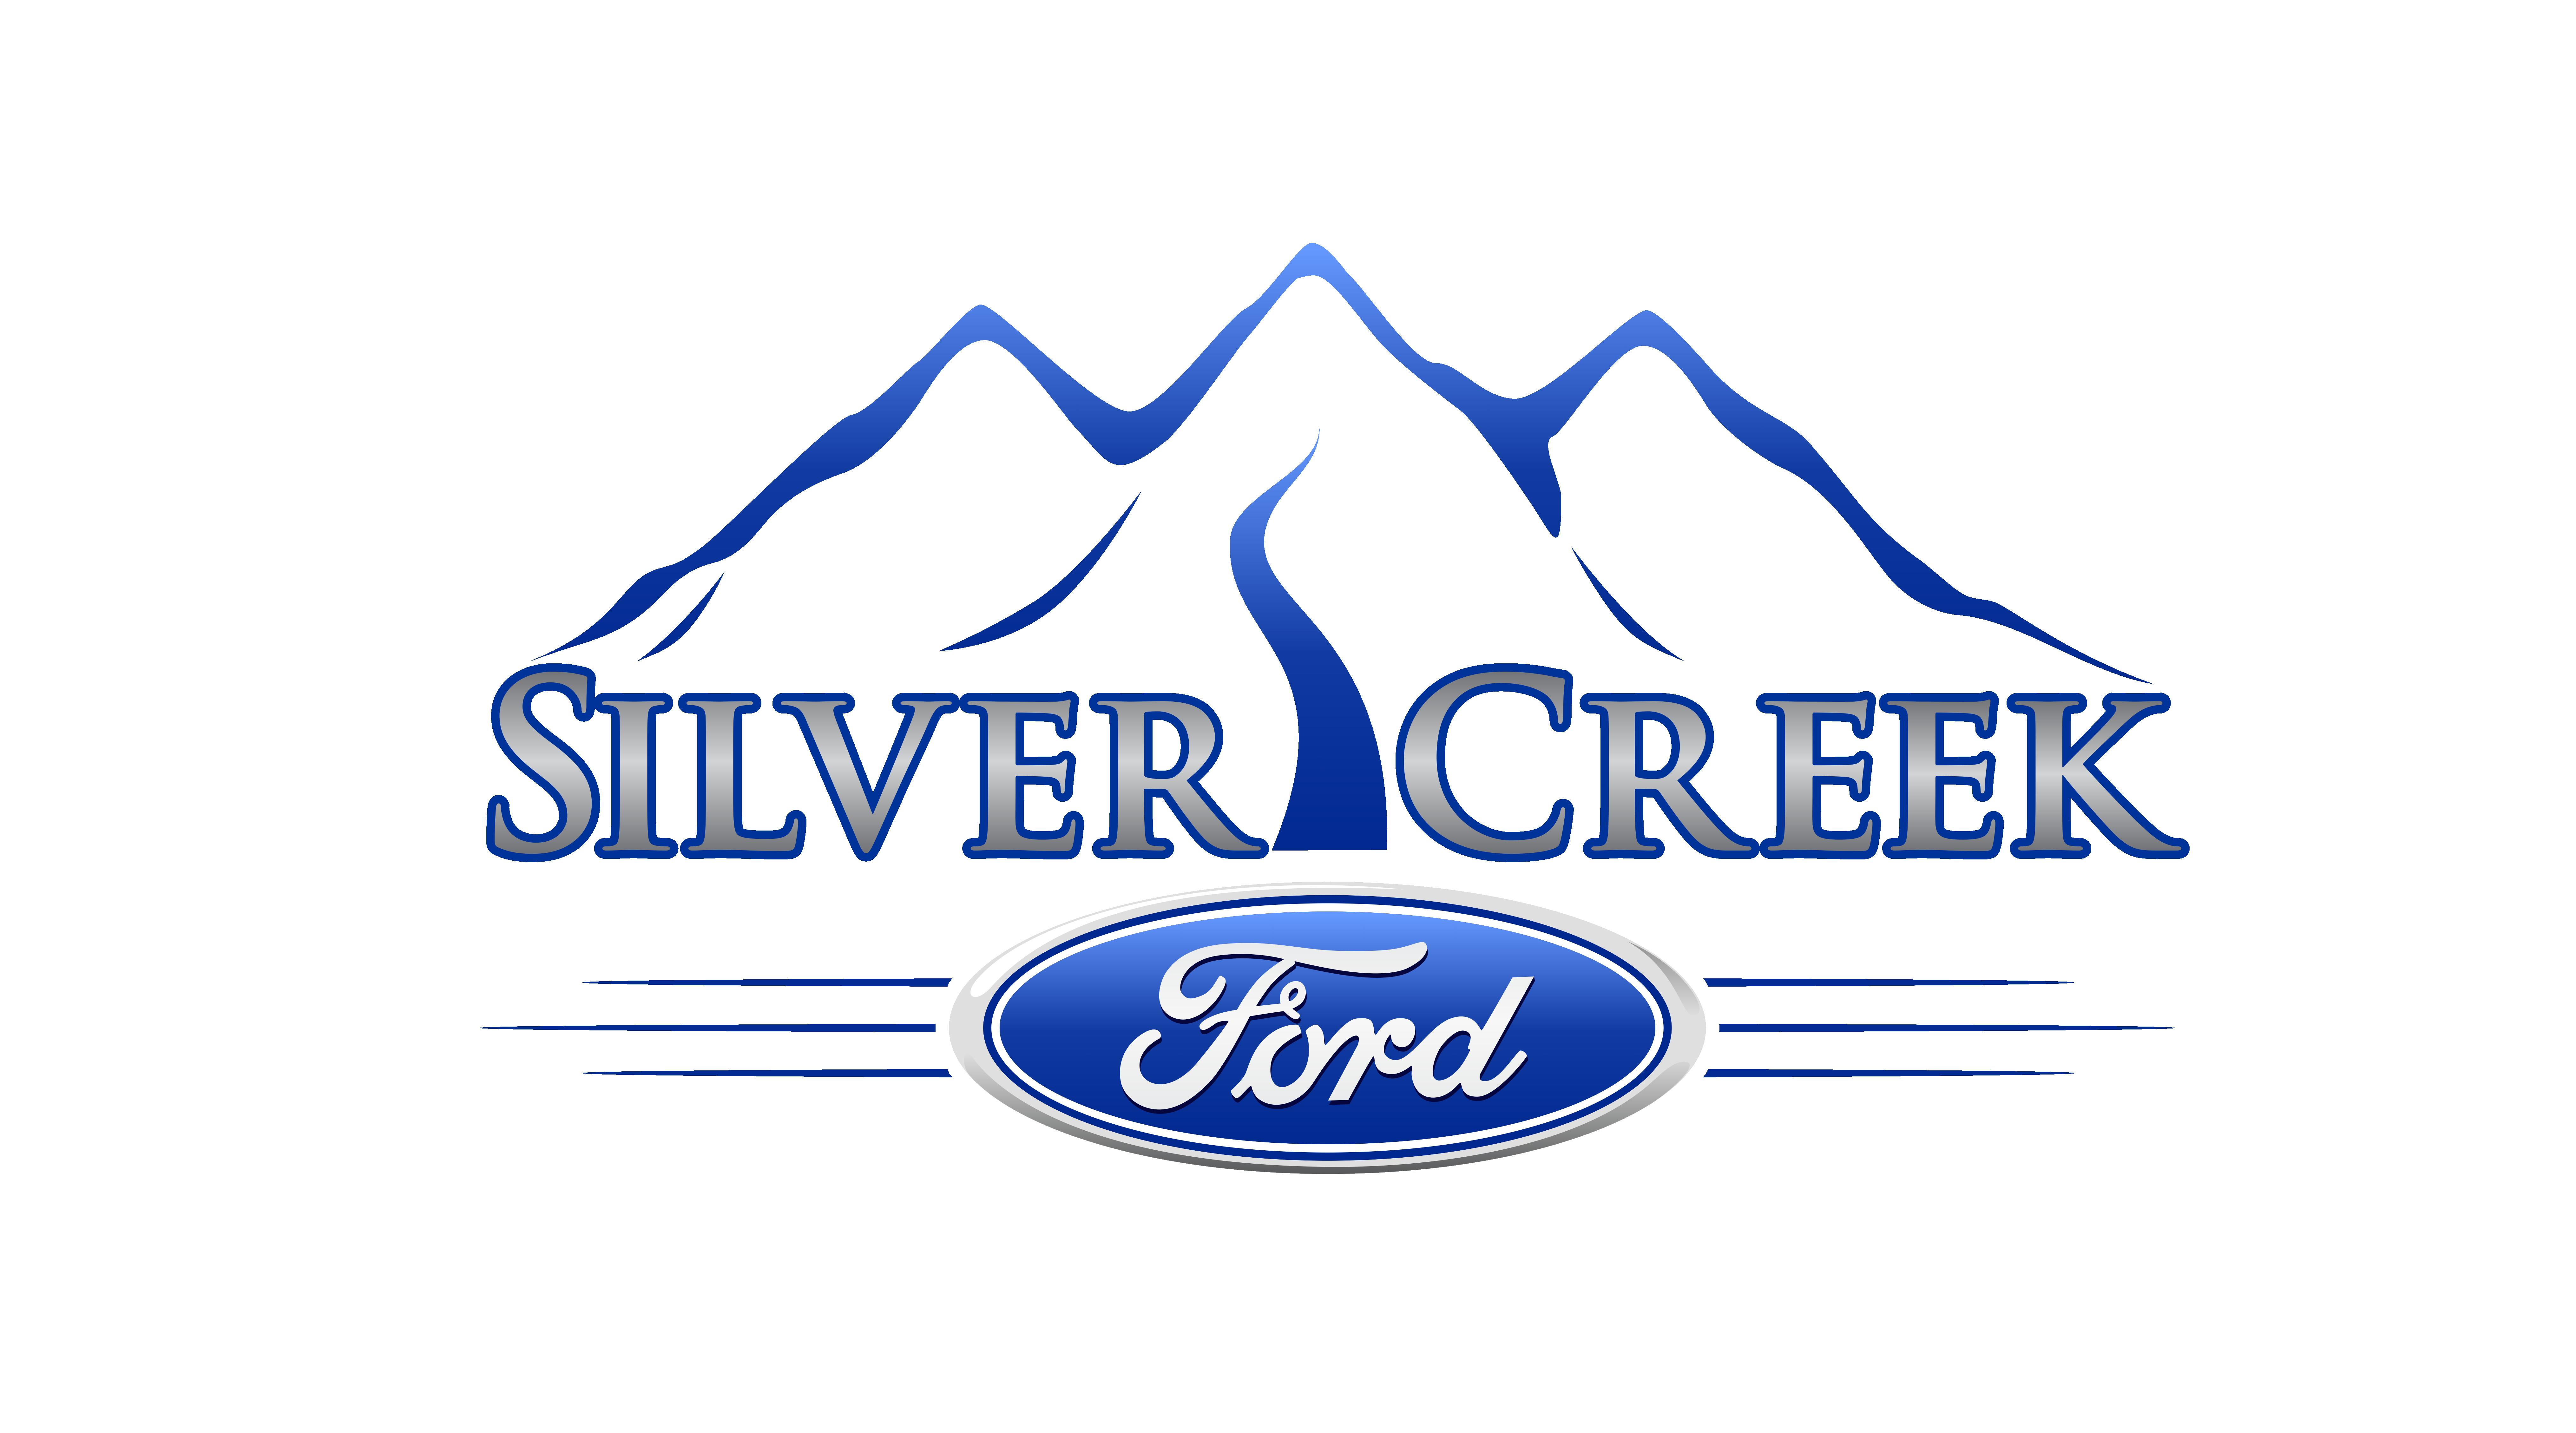 Silver Creek Ford